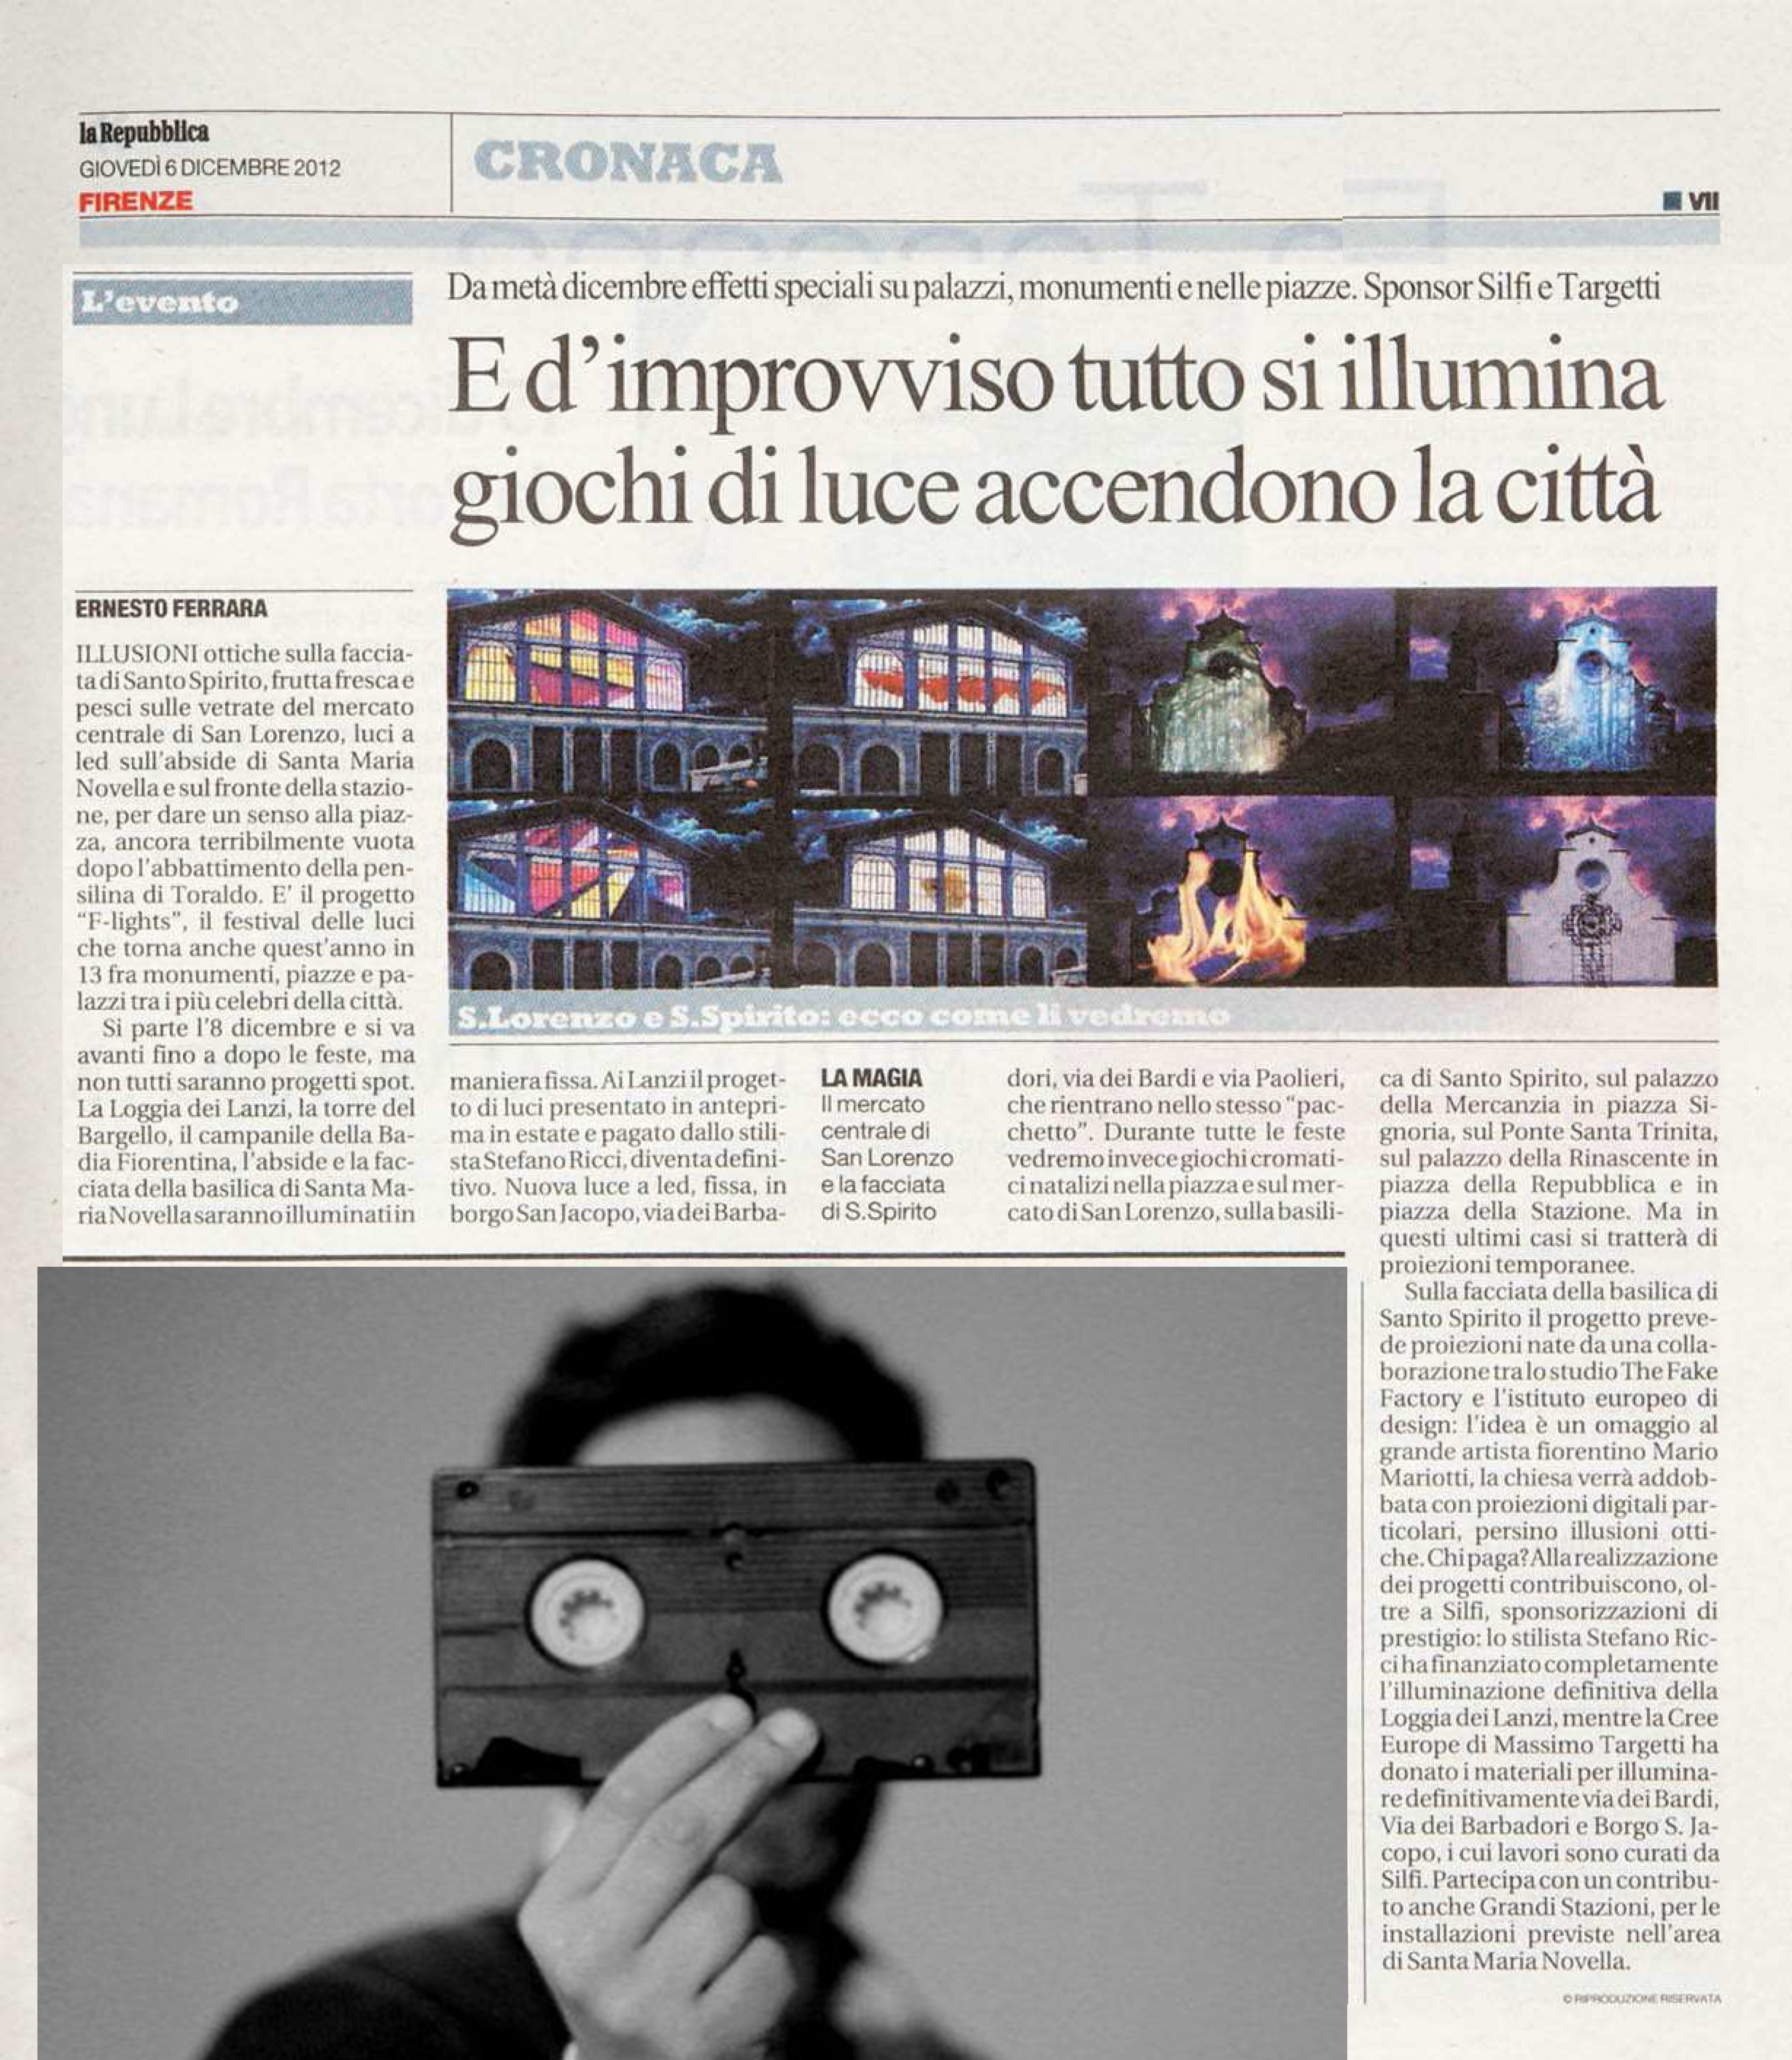 Firenze-laRepubblica_06-12-2012.jpg